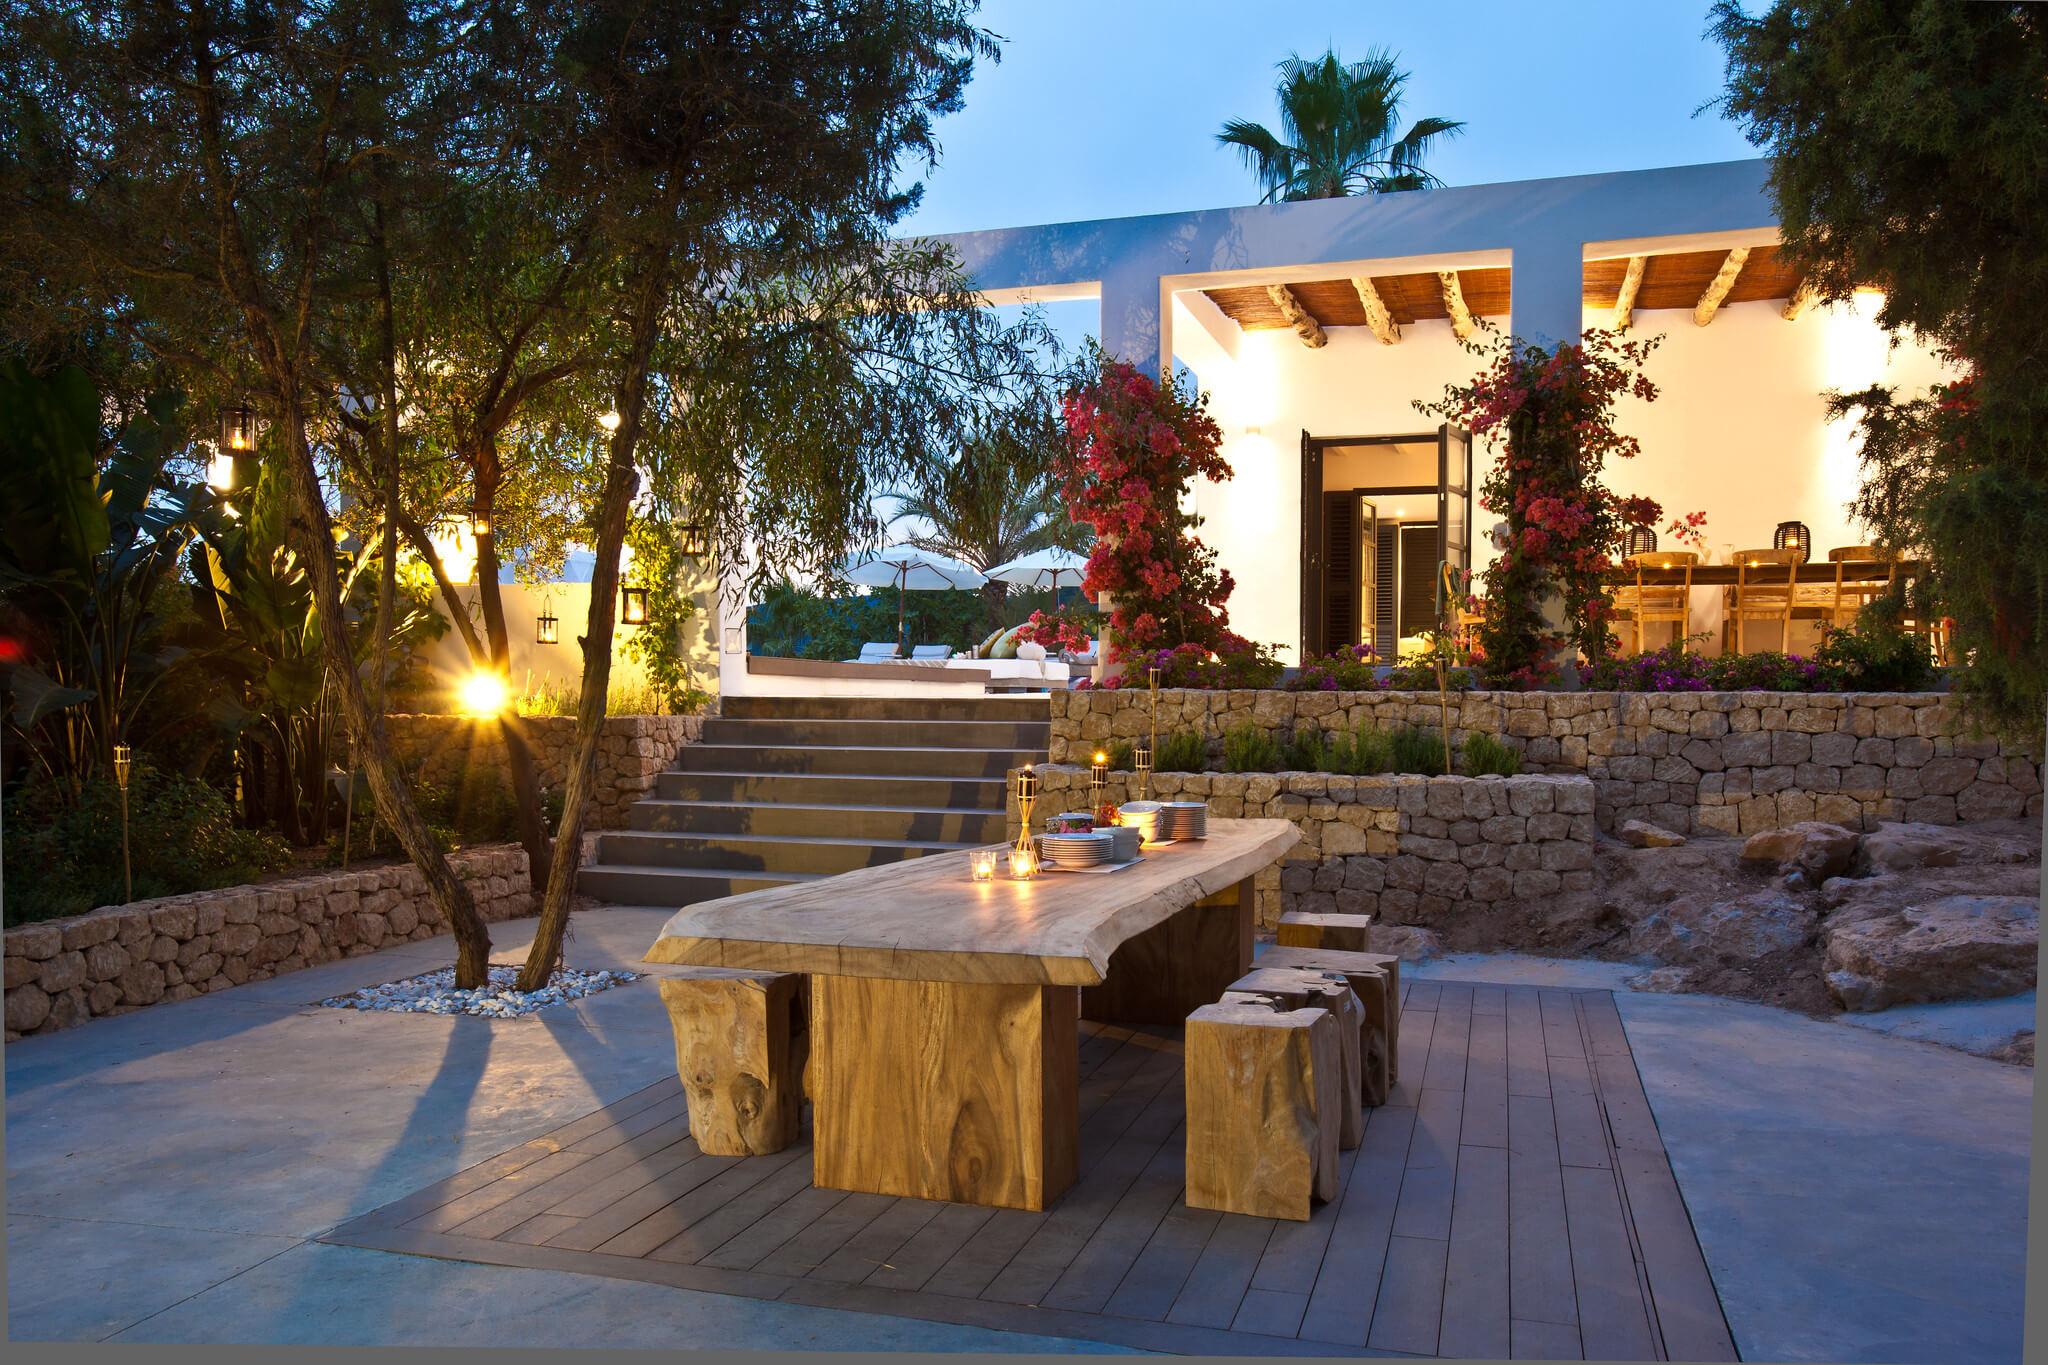 https://www.white-ibiza.com/wp-content/uploads/2020/05/white-ibiza-villas-casa-amalia-exterior-evening.jpg